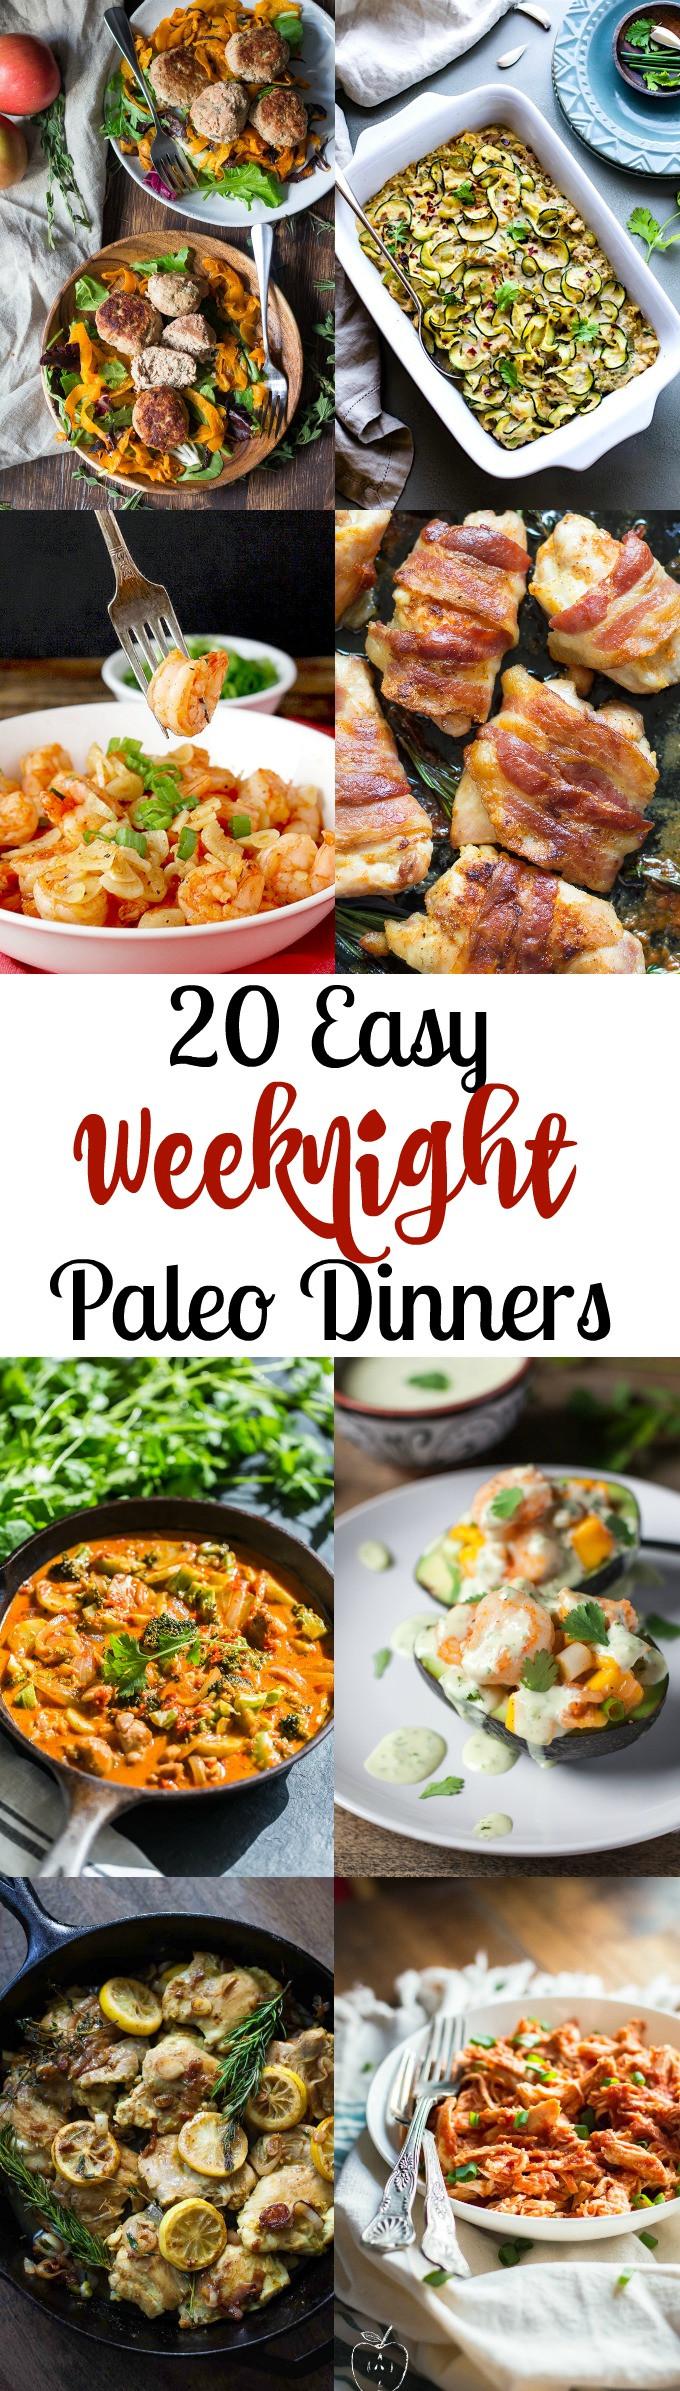 Easy Paleo Dinner  20 Easy Paleo Dinners for Weeknights